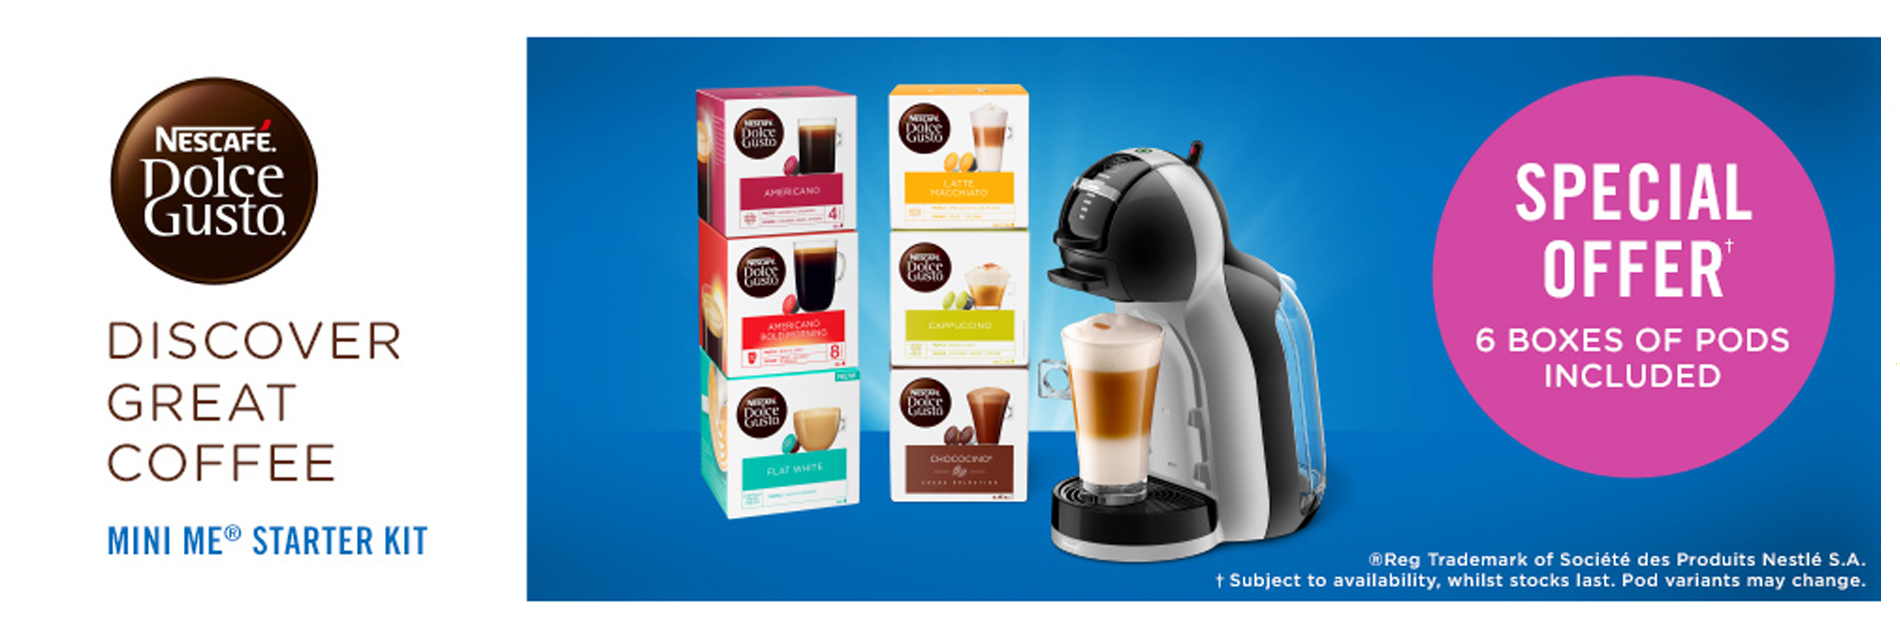 http://www.enaturalltd.com/product-category/coffee-machines/